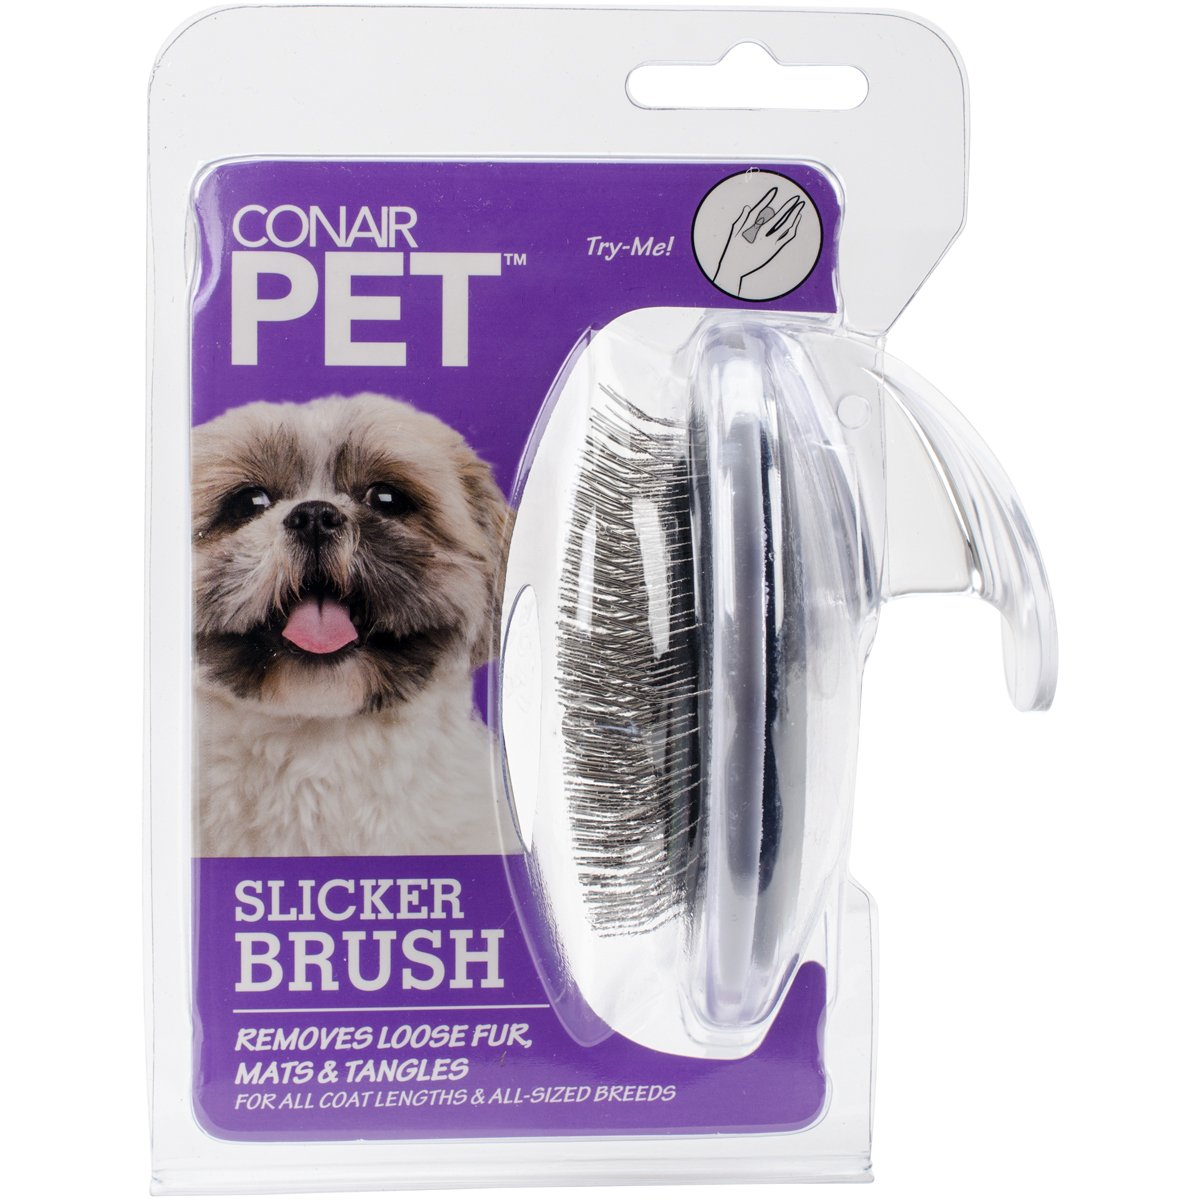 Conair Pet Groom-Me Slicker Brush